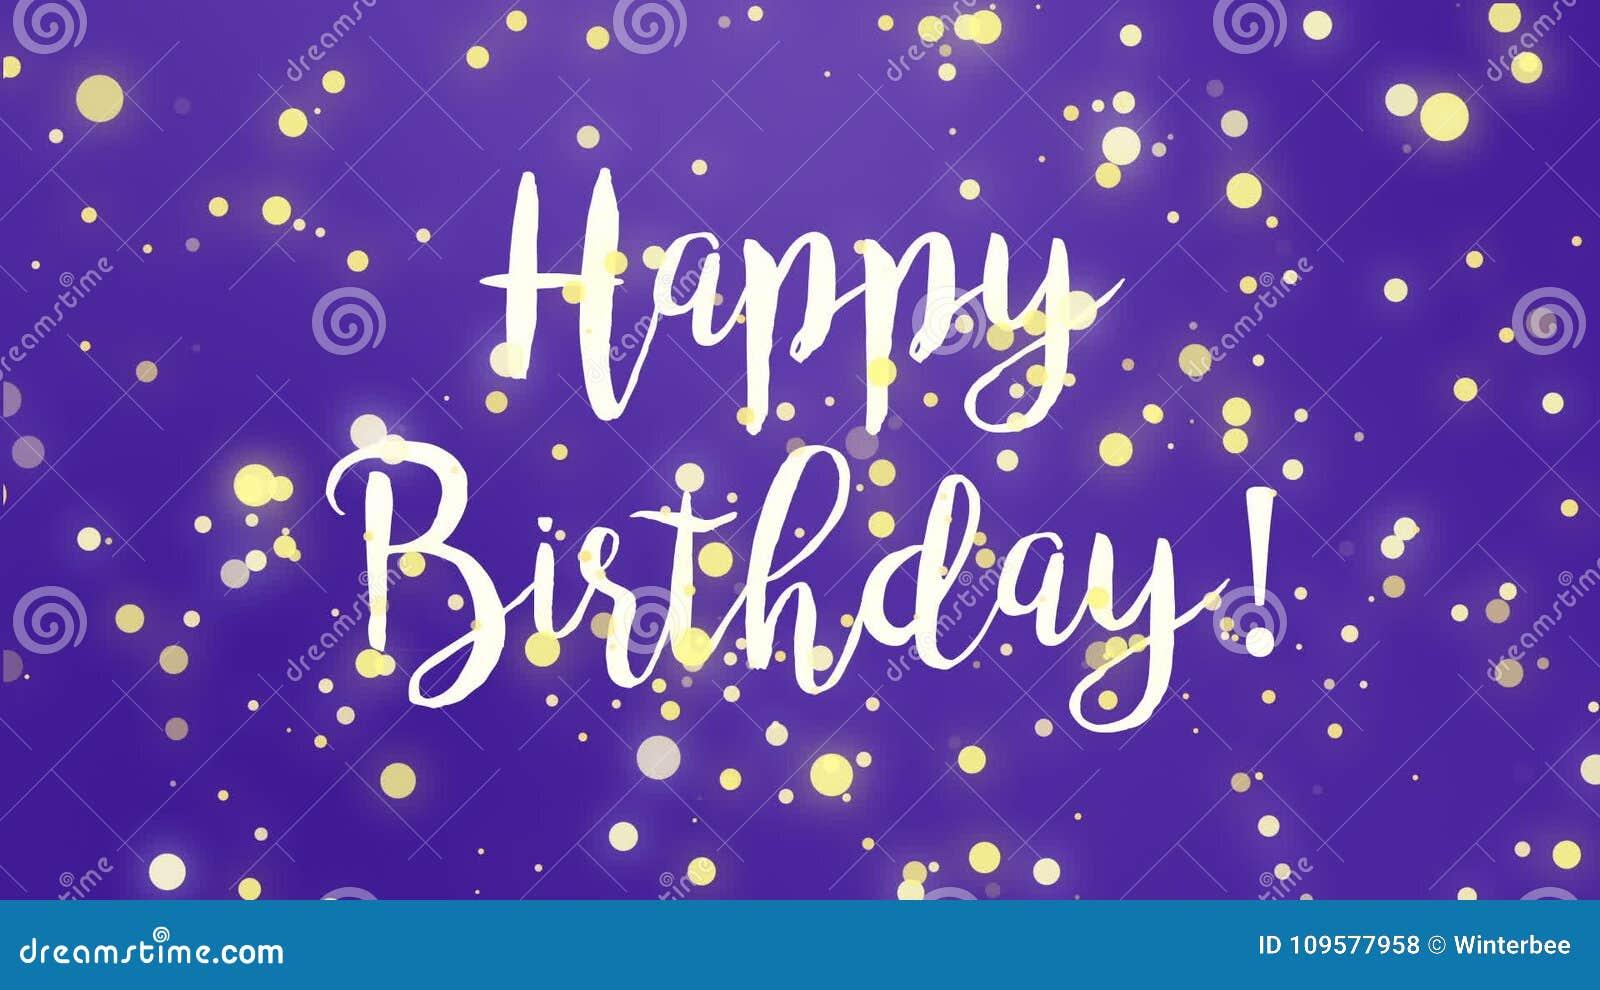 Purple Happy Birthday Greeting Card Video Stock Footage Video Of